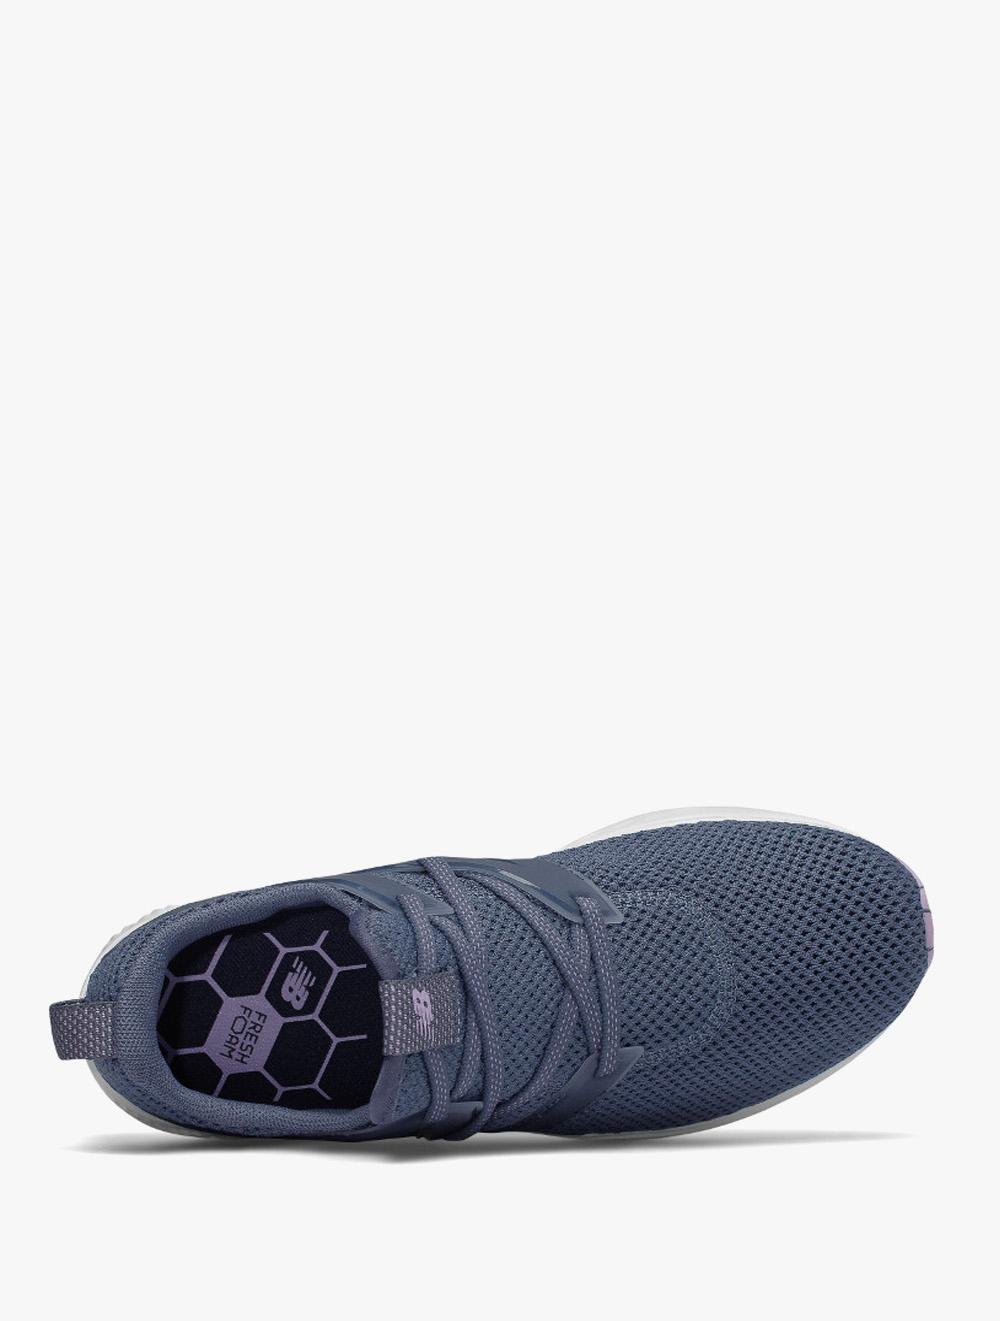 Fresh Foam Vero Sport Women's Running Shoes